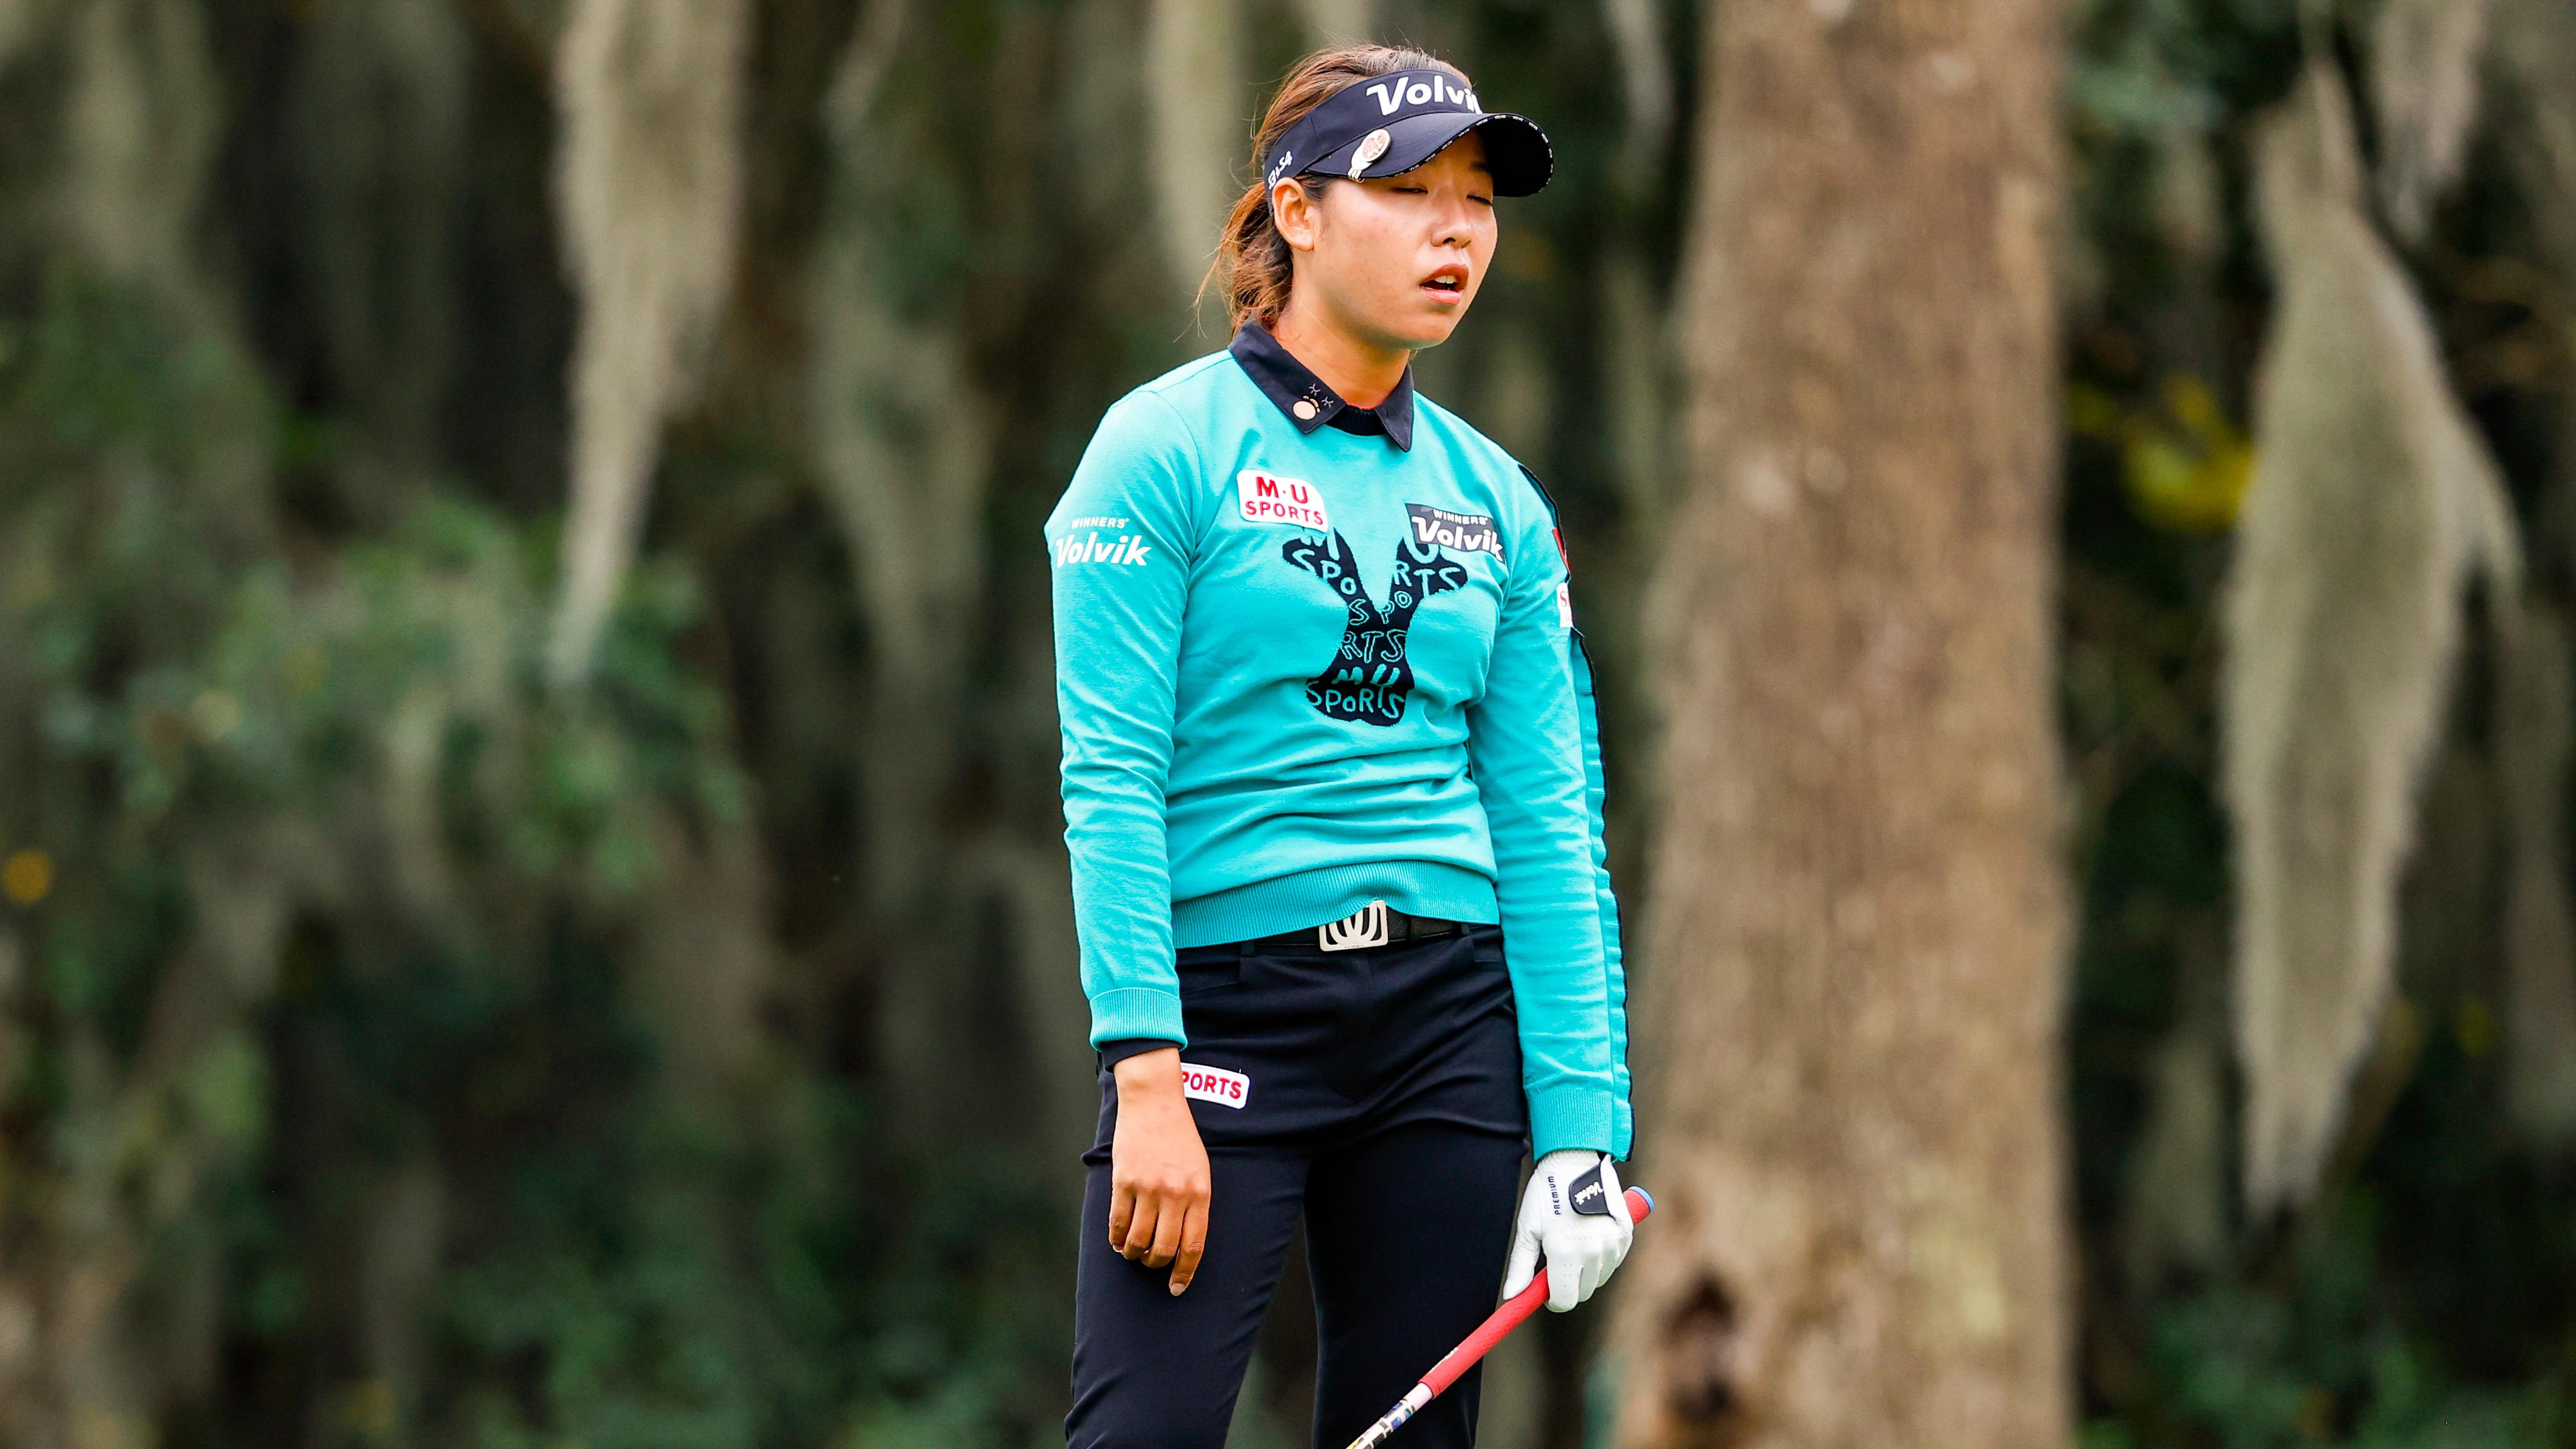 http://res.cloudinary.com/usga/image/upload/v1/usga/images/championships/2020/womens-open/galleries/saturday-round-three/20USWO_1212__S7I6912.jpg